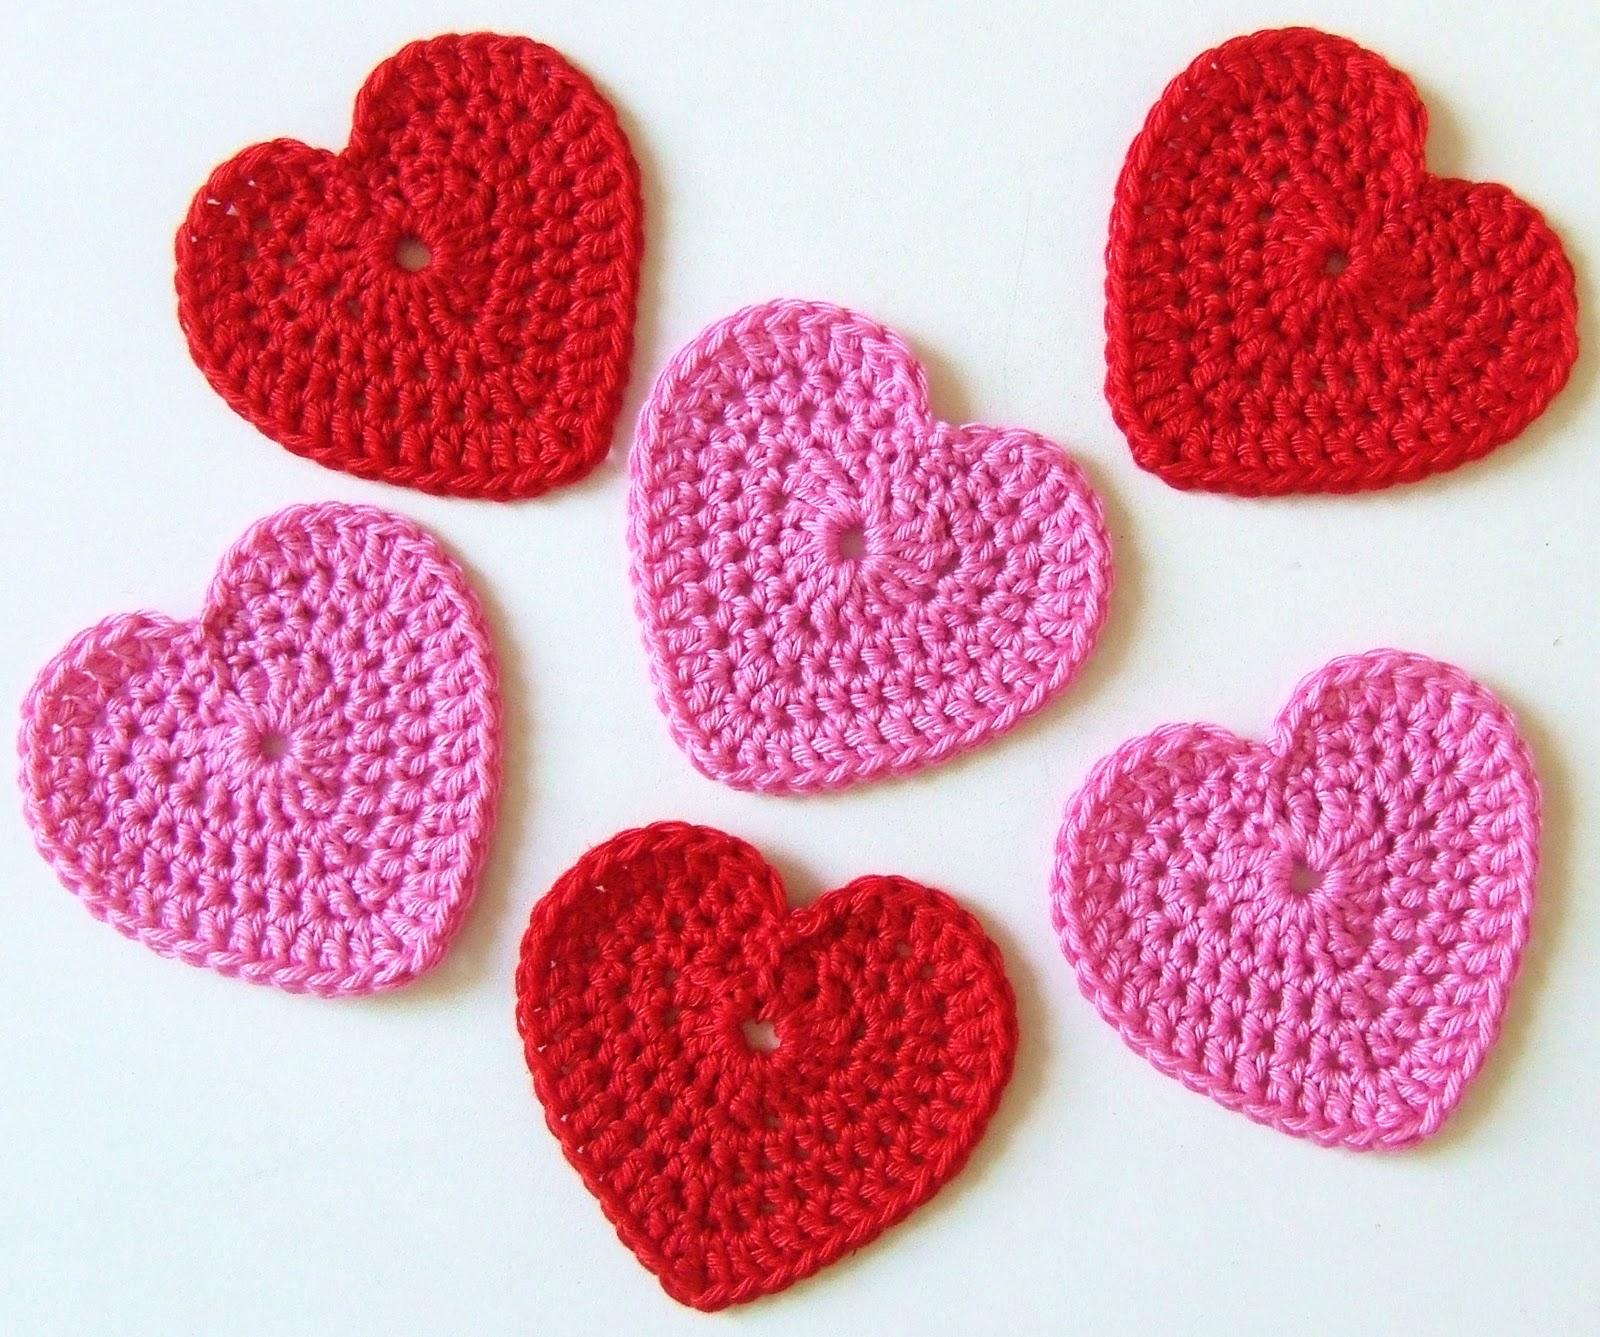 Crochet Heart Patterns For Beginners : Blij dat ik brei: Ik ook van jou...